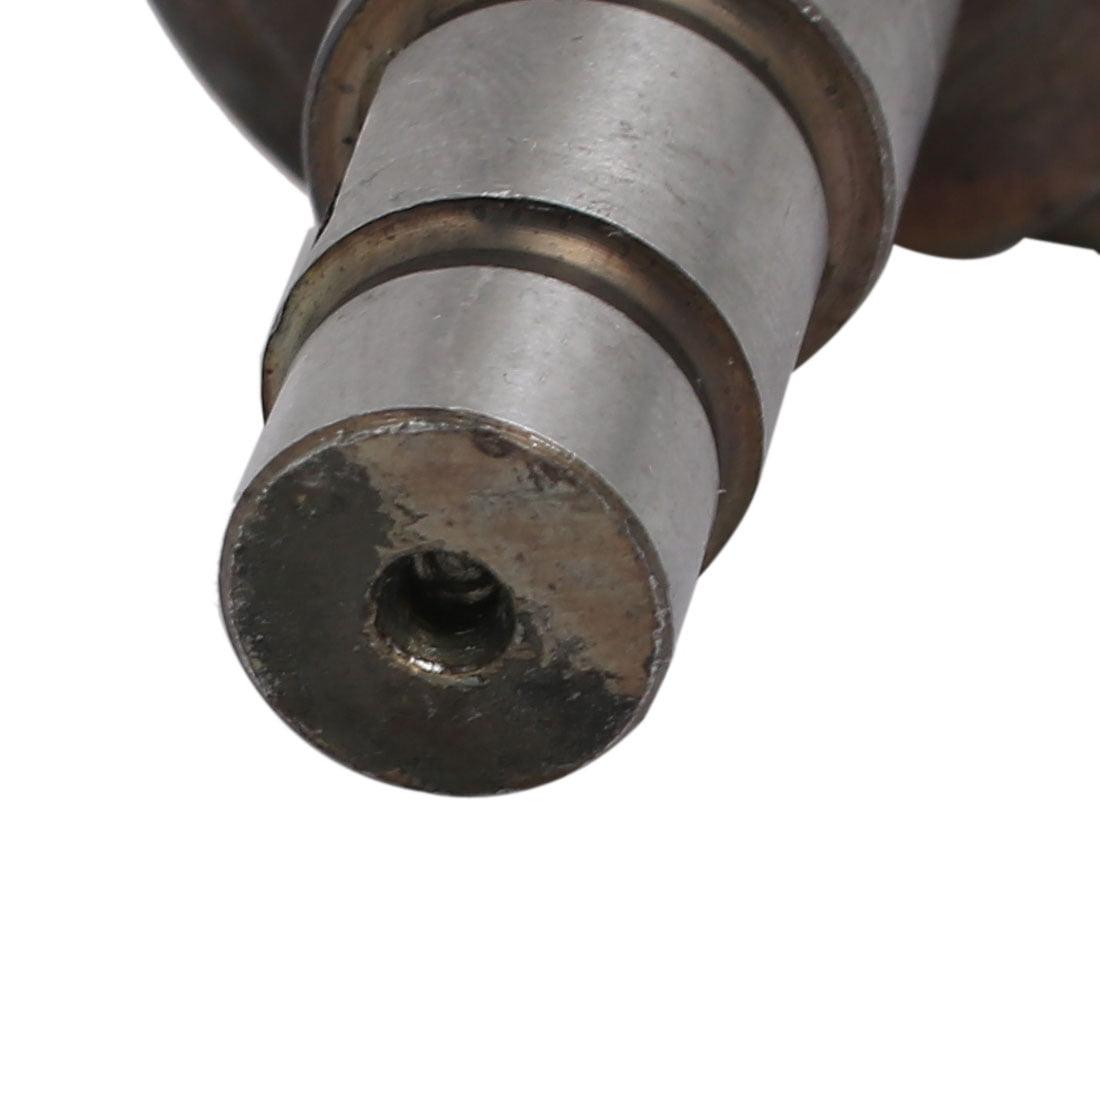 Power Tool Fittings Crankshaft Silver Tone for  0810 Electric Pick - image 1 de 3